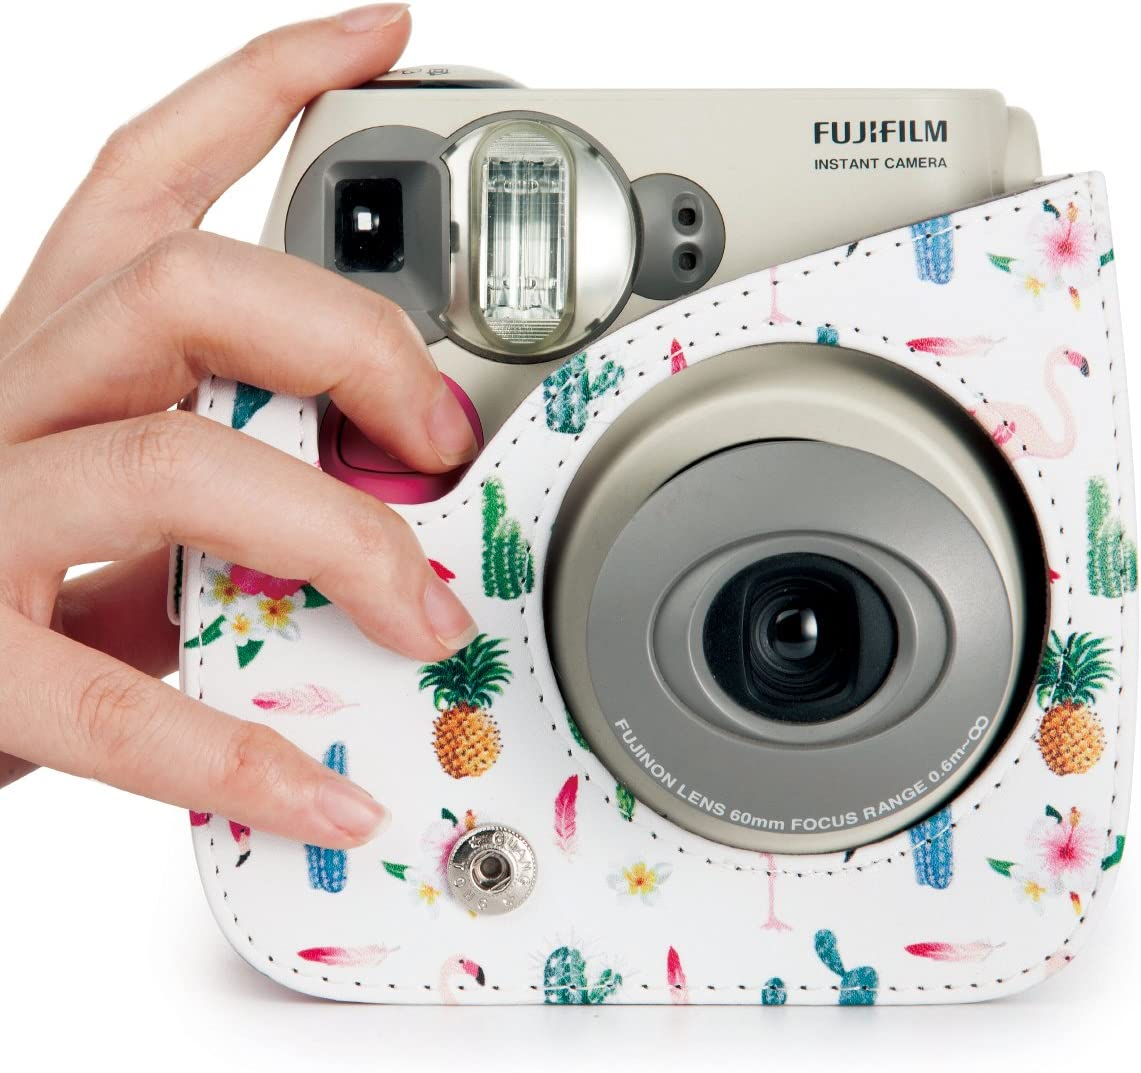 Galaxy, 7 Items CAIUL Compatible Mini 7s Case Bundle with Album Filters /& Accessories for Fujifilm Instax Mini 7s and Polaroid PIC-300 Camera